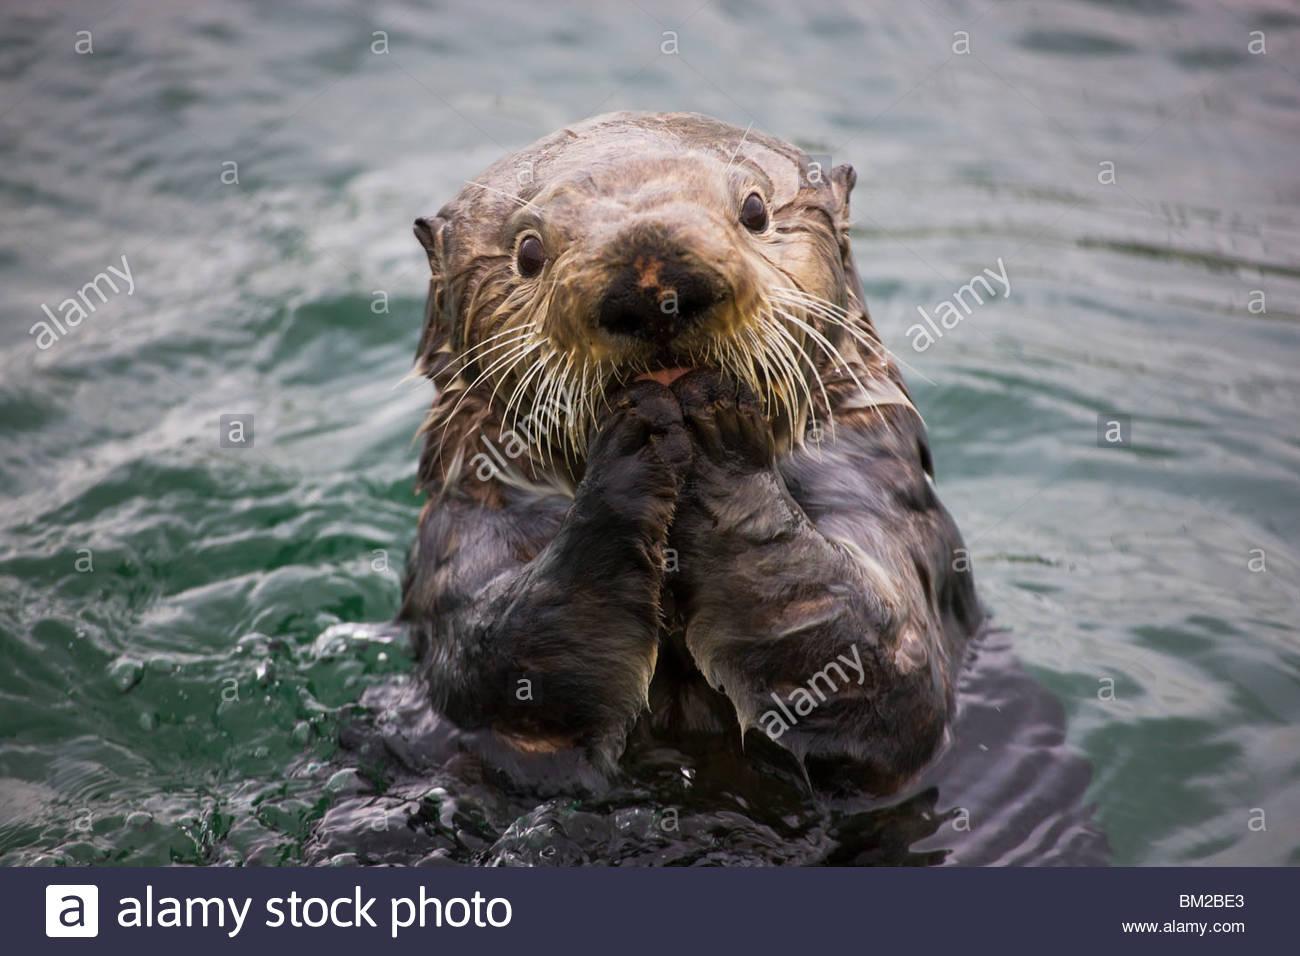 Sea Otter (Enhydra lutris), Cordova, Alaska - Stock Image